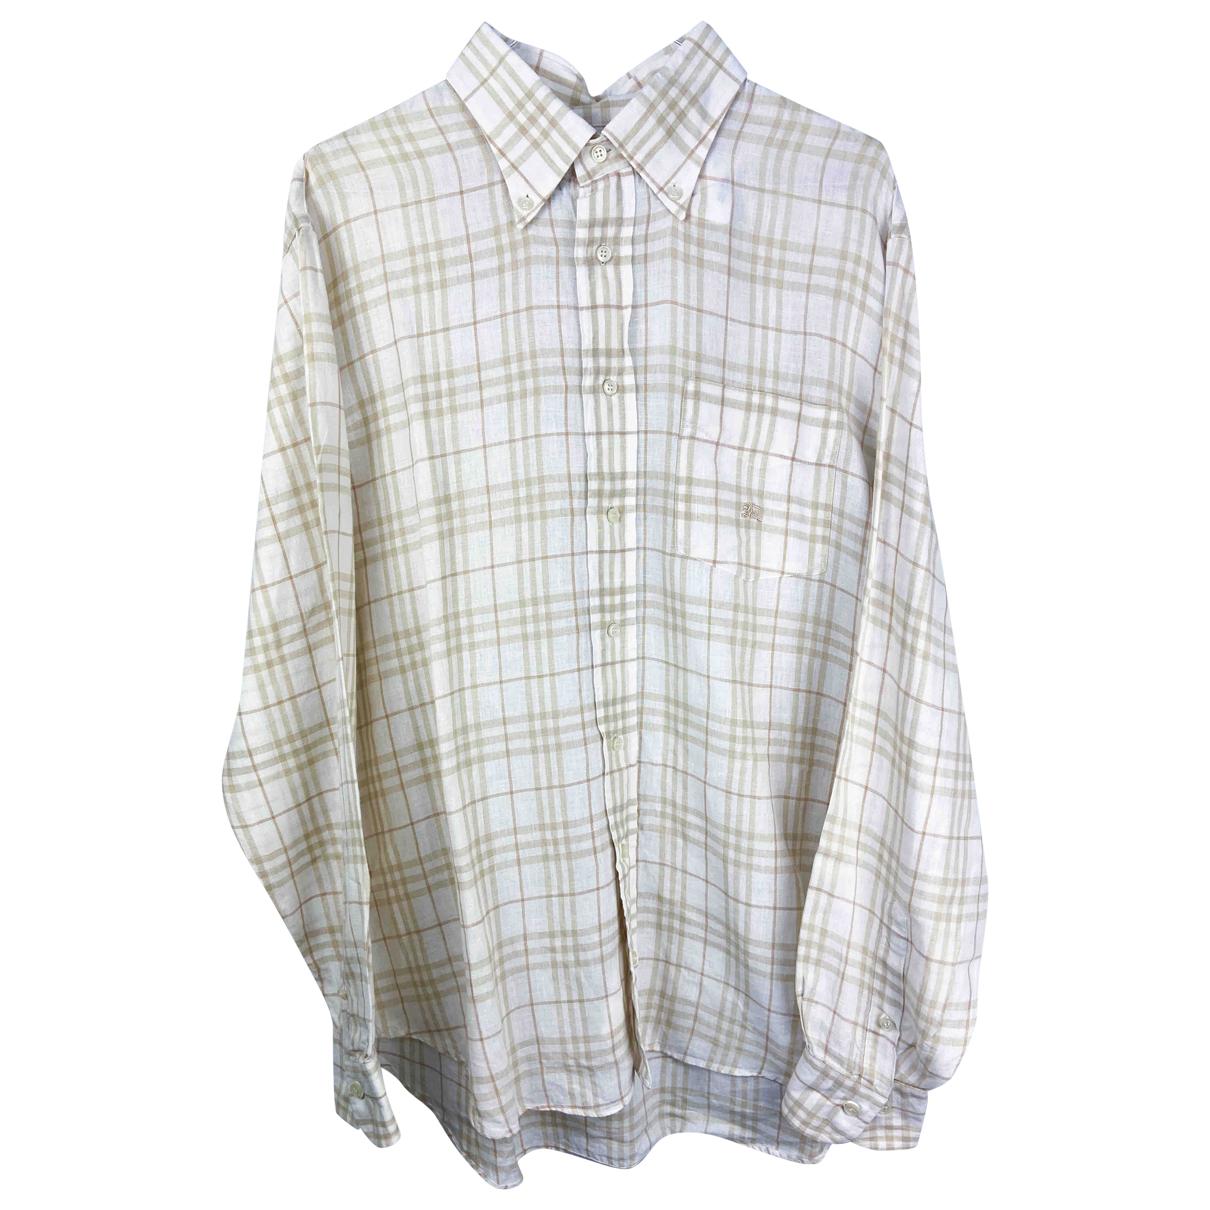 Burberry \N Beige Linen Shirts for Men L International